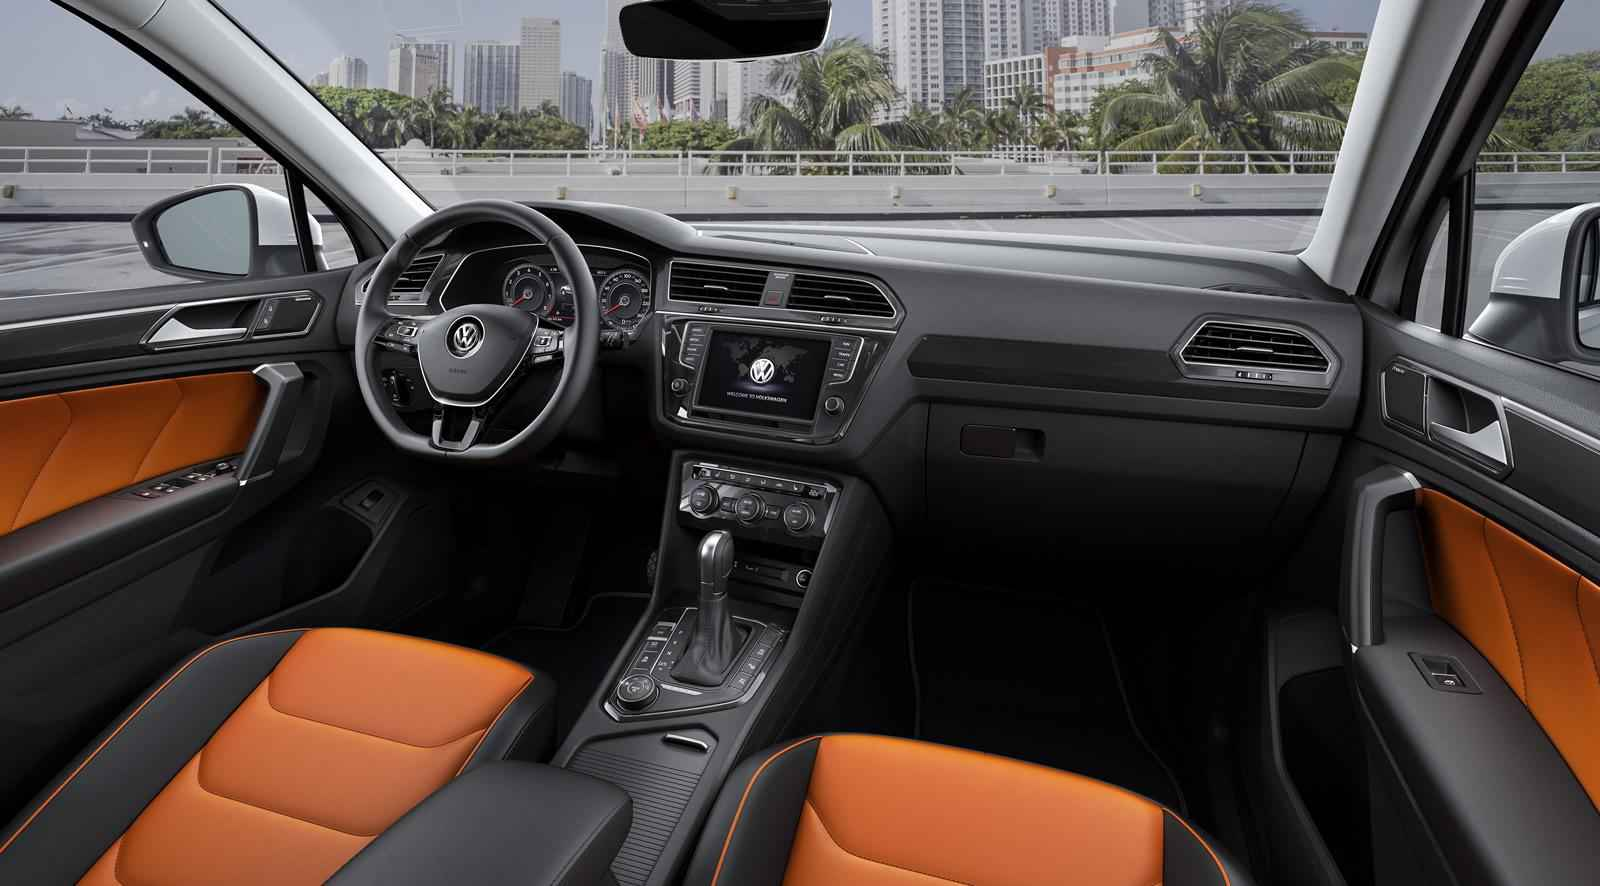 2016 Volkswagen Tiguan R-Line İç Tasarım